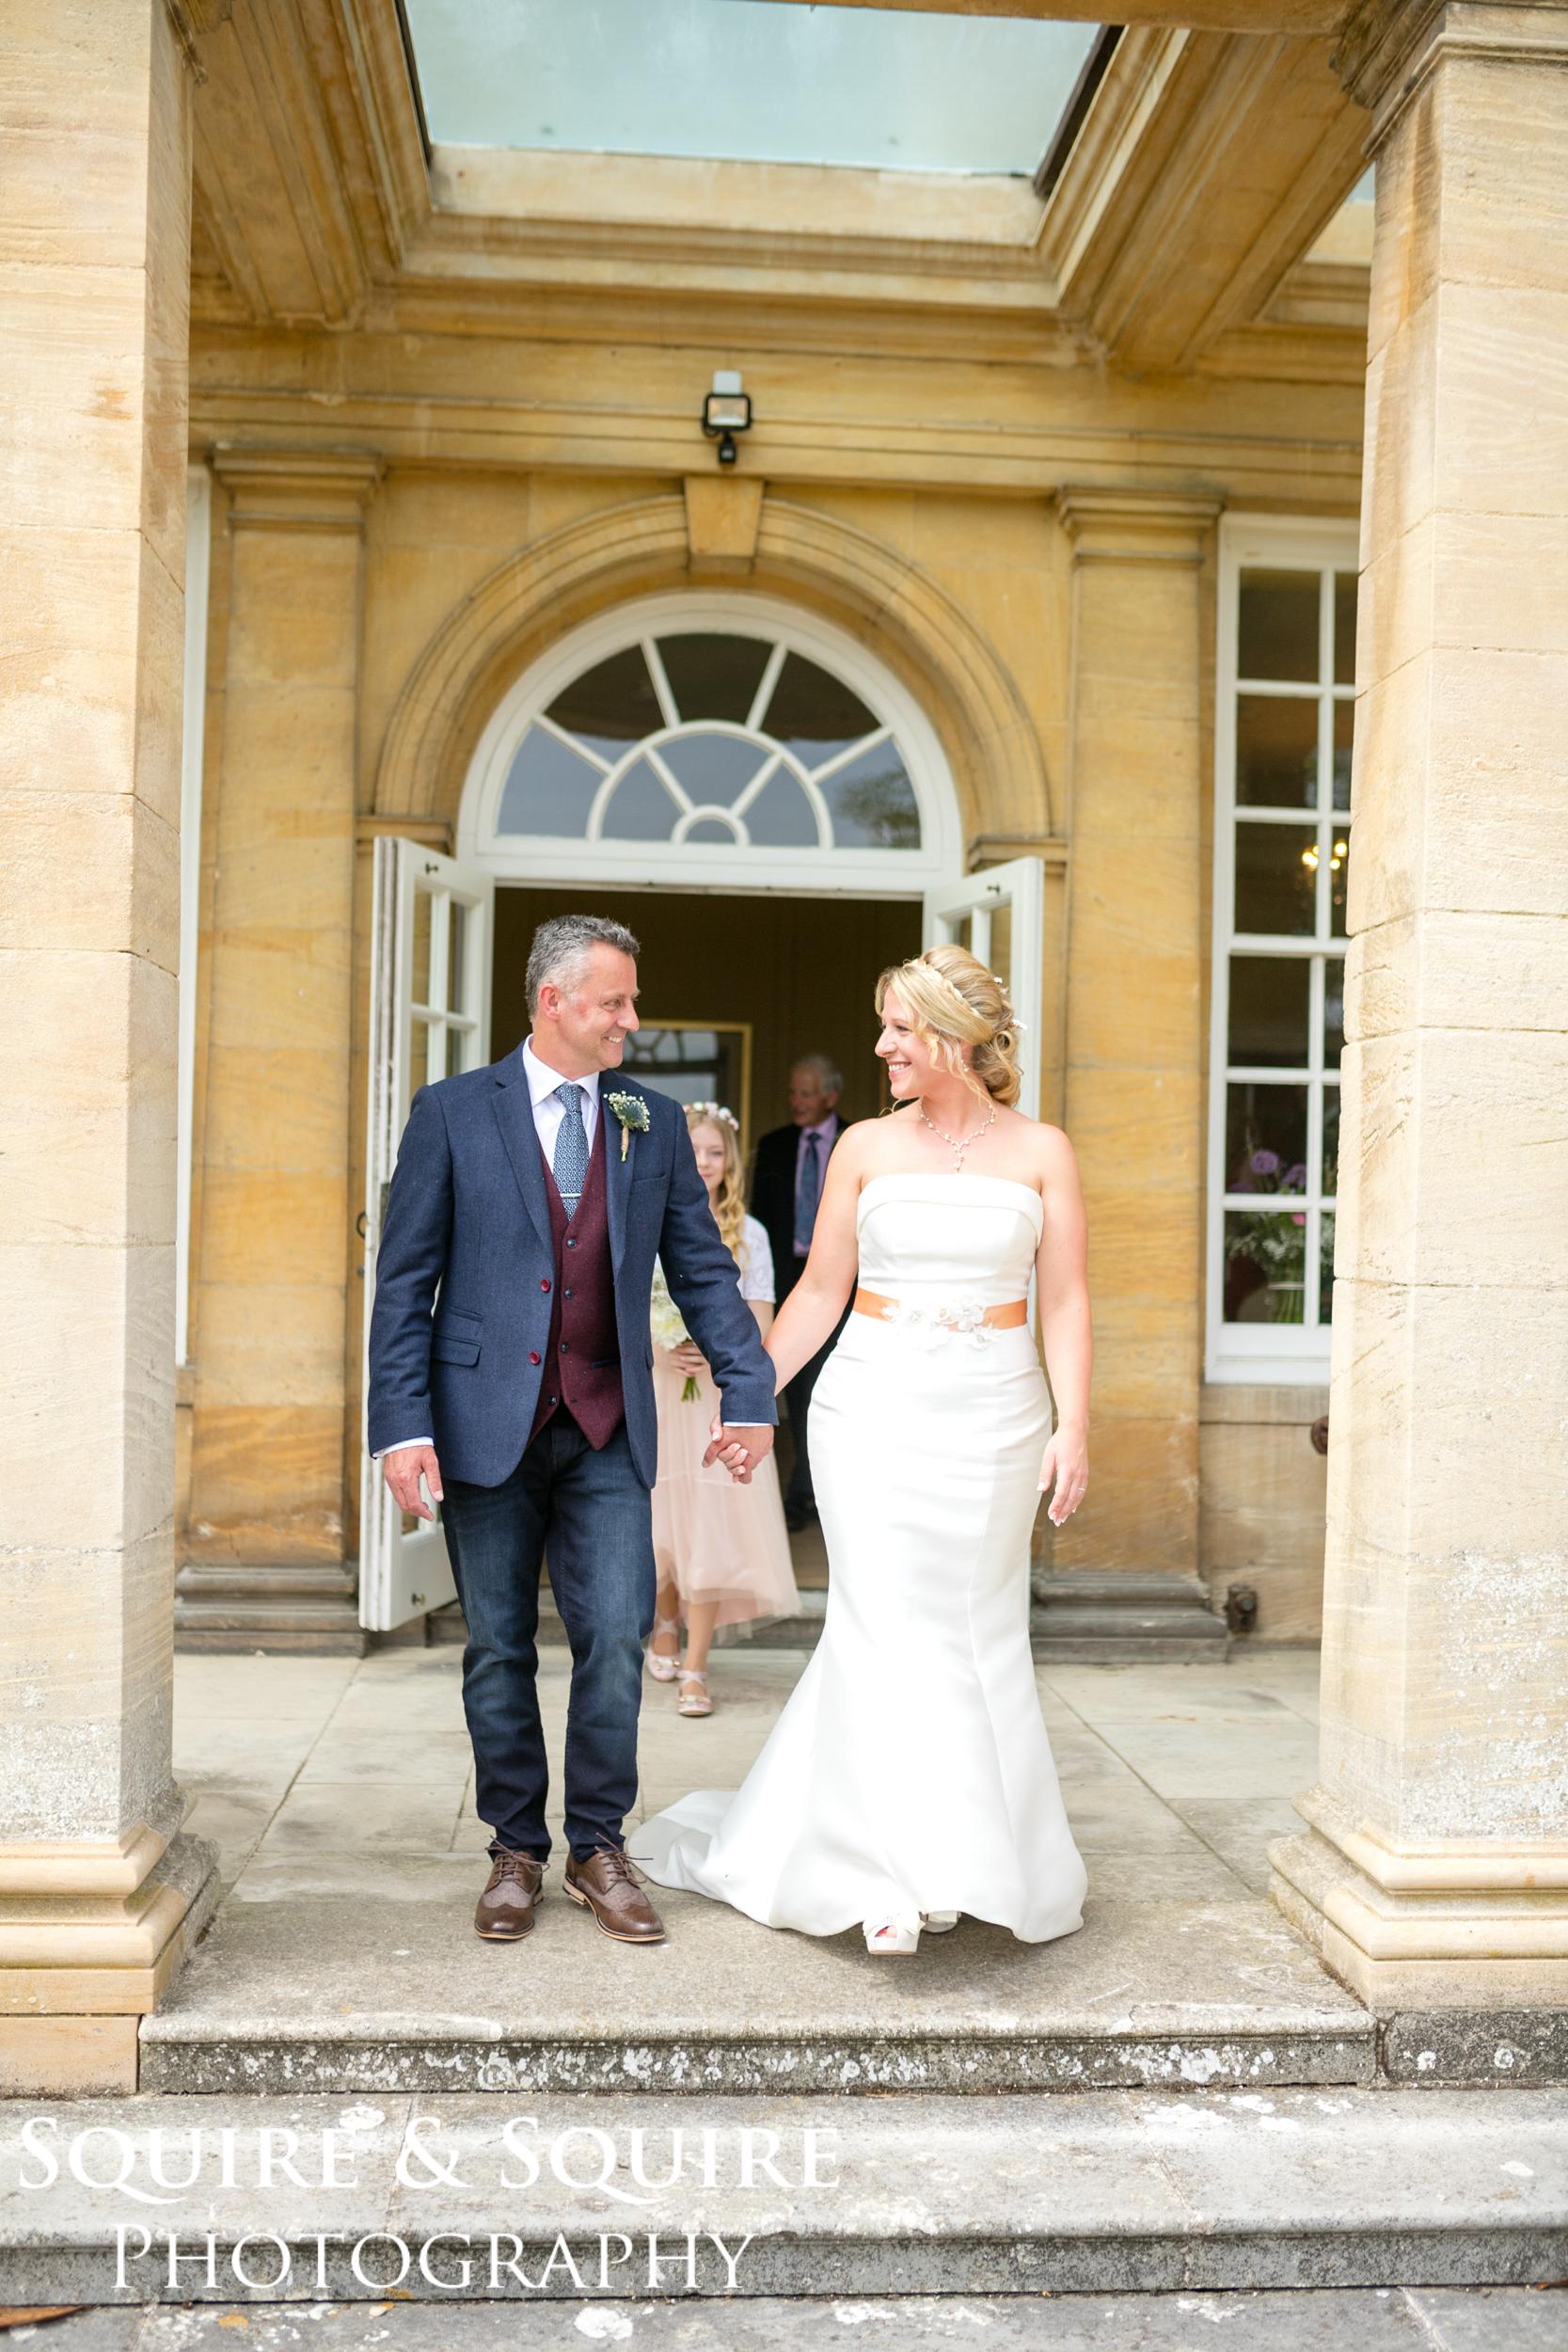 wedding_photography_catthorpe Manor (42 of 66).jpg